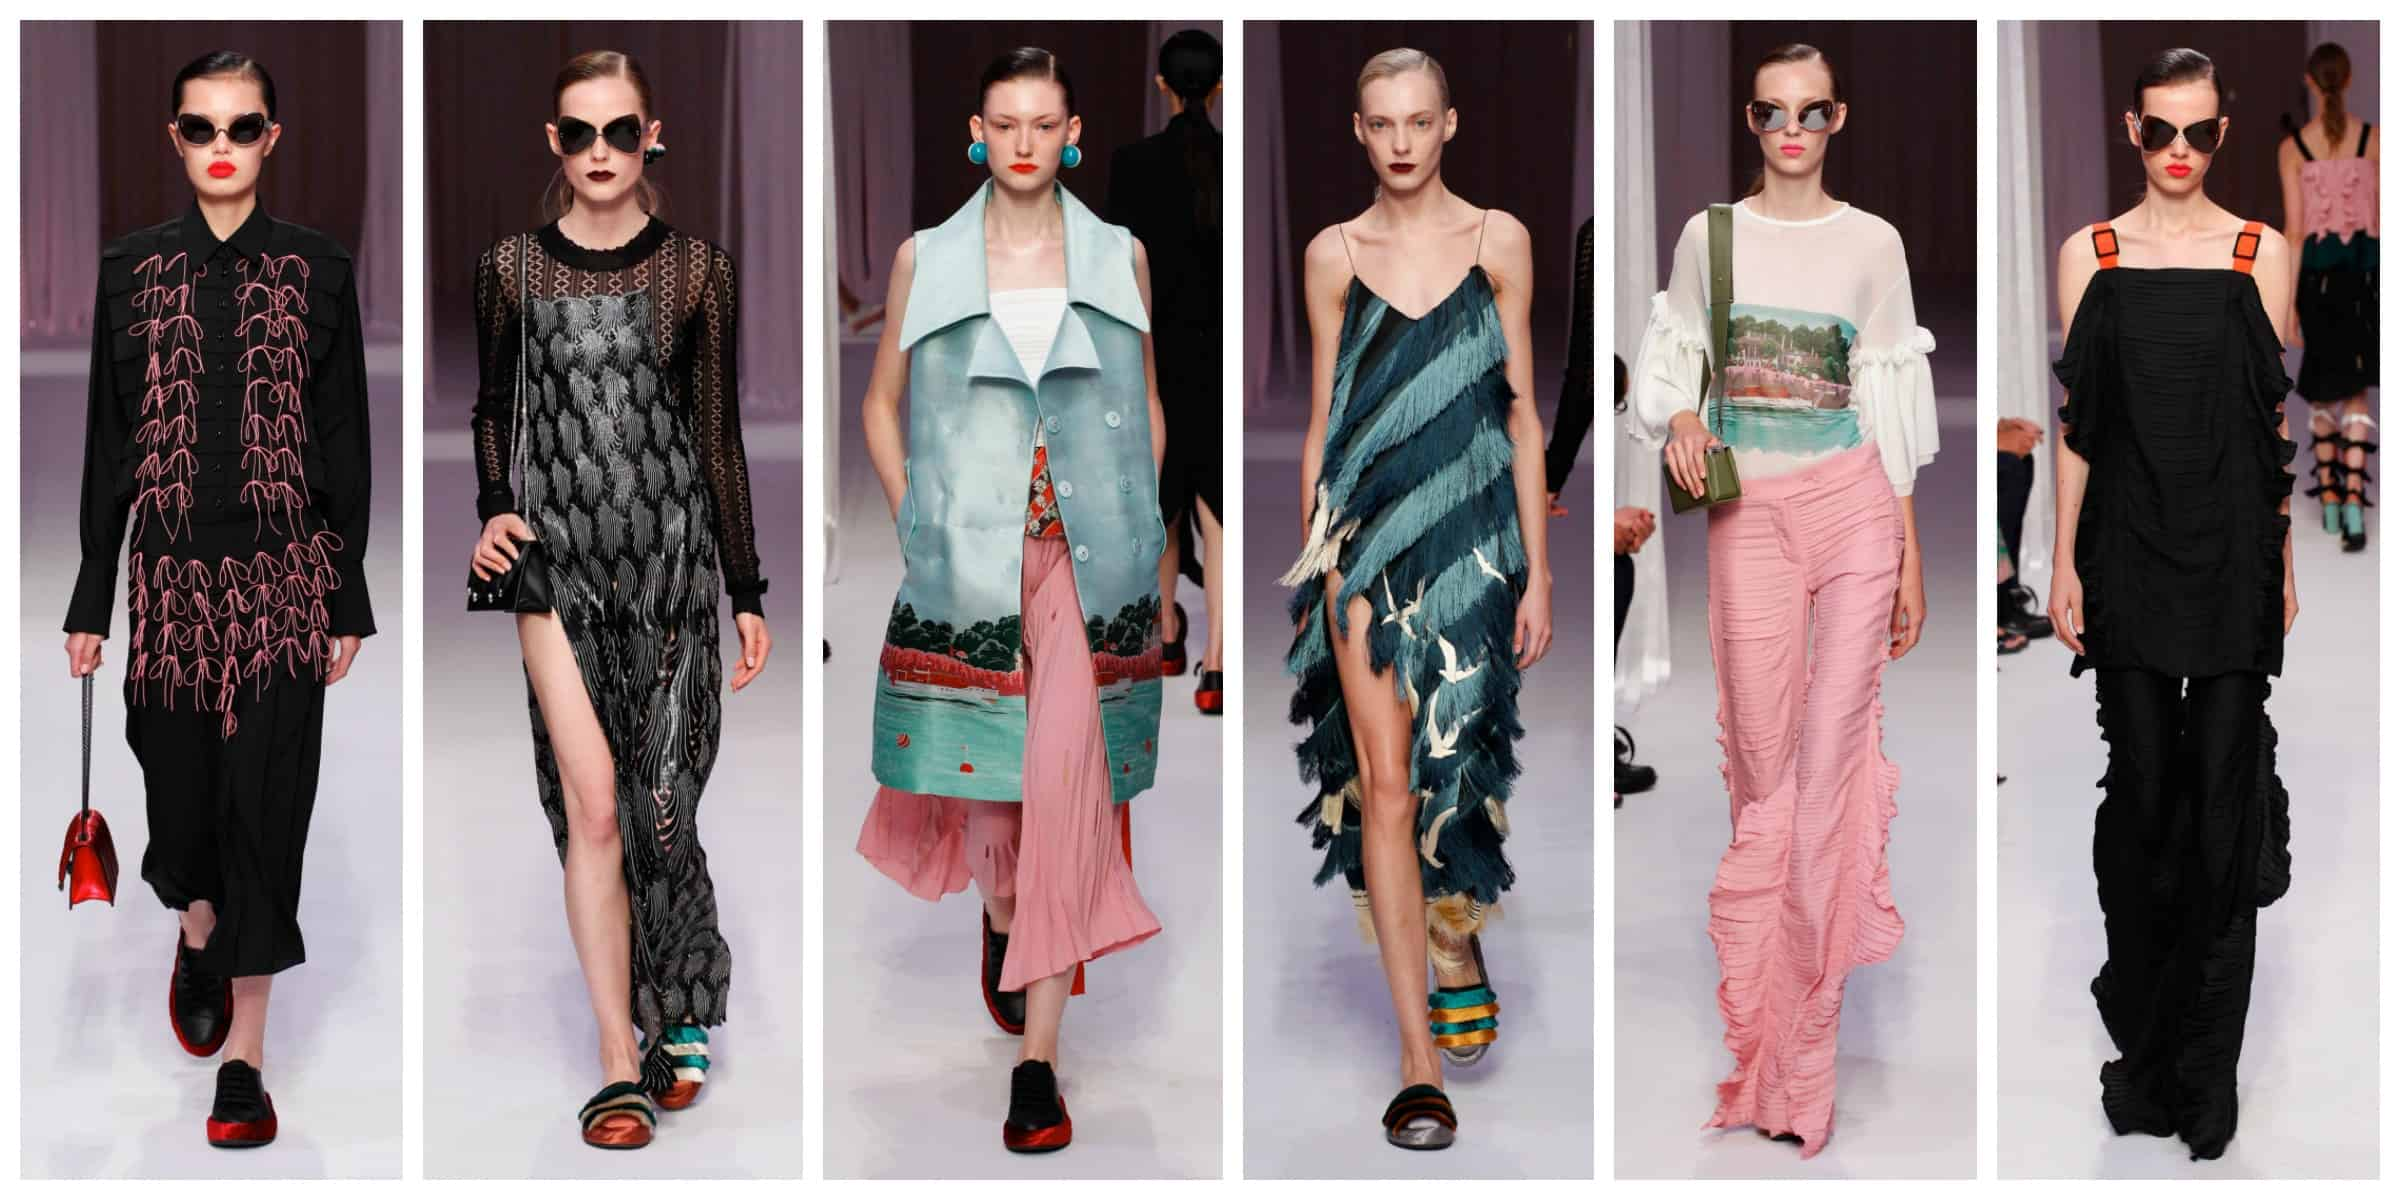 Marco De Vincenzo - Milan Fashion Week Spring 2017